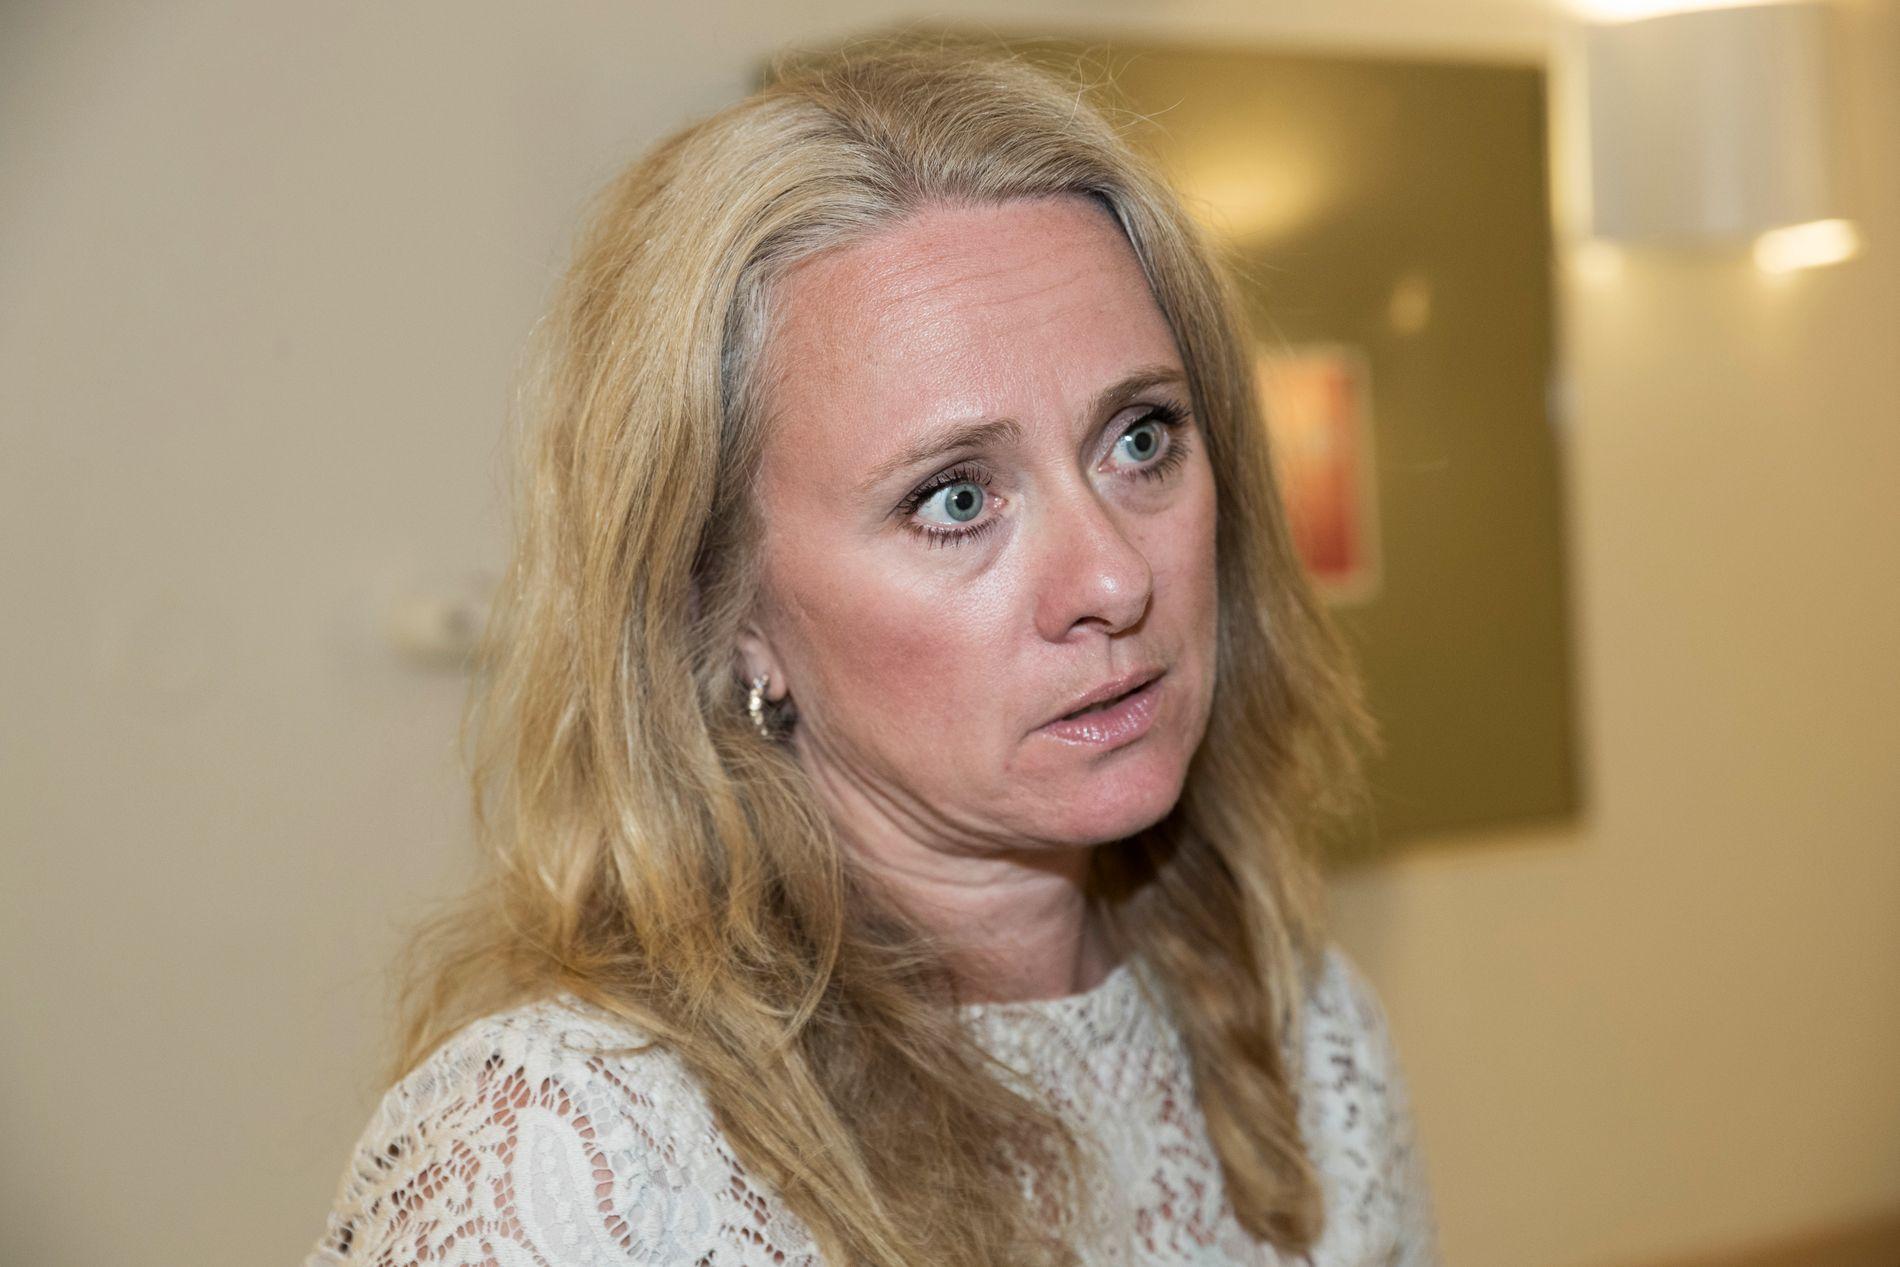 RYSTET: Anniken Hauglie (H) vil ha nulltoleranse for vold og trusler i norsk arbeidsliv.